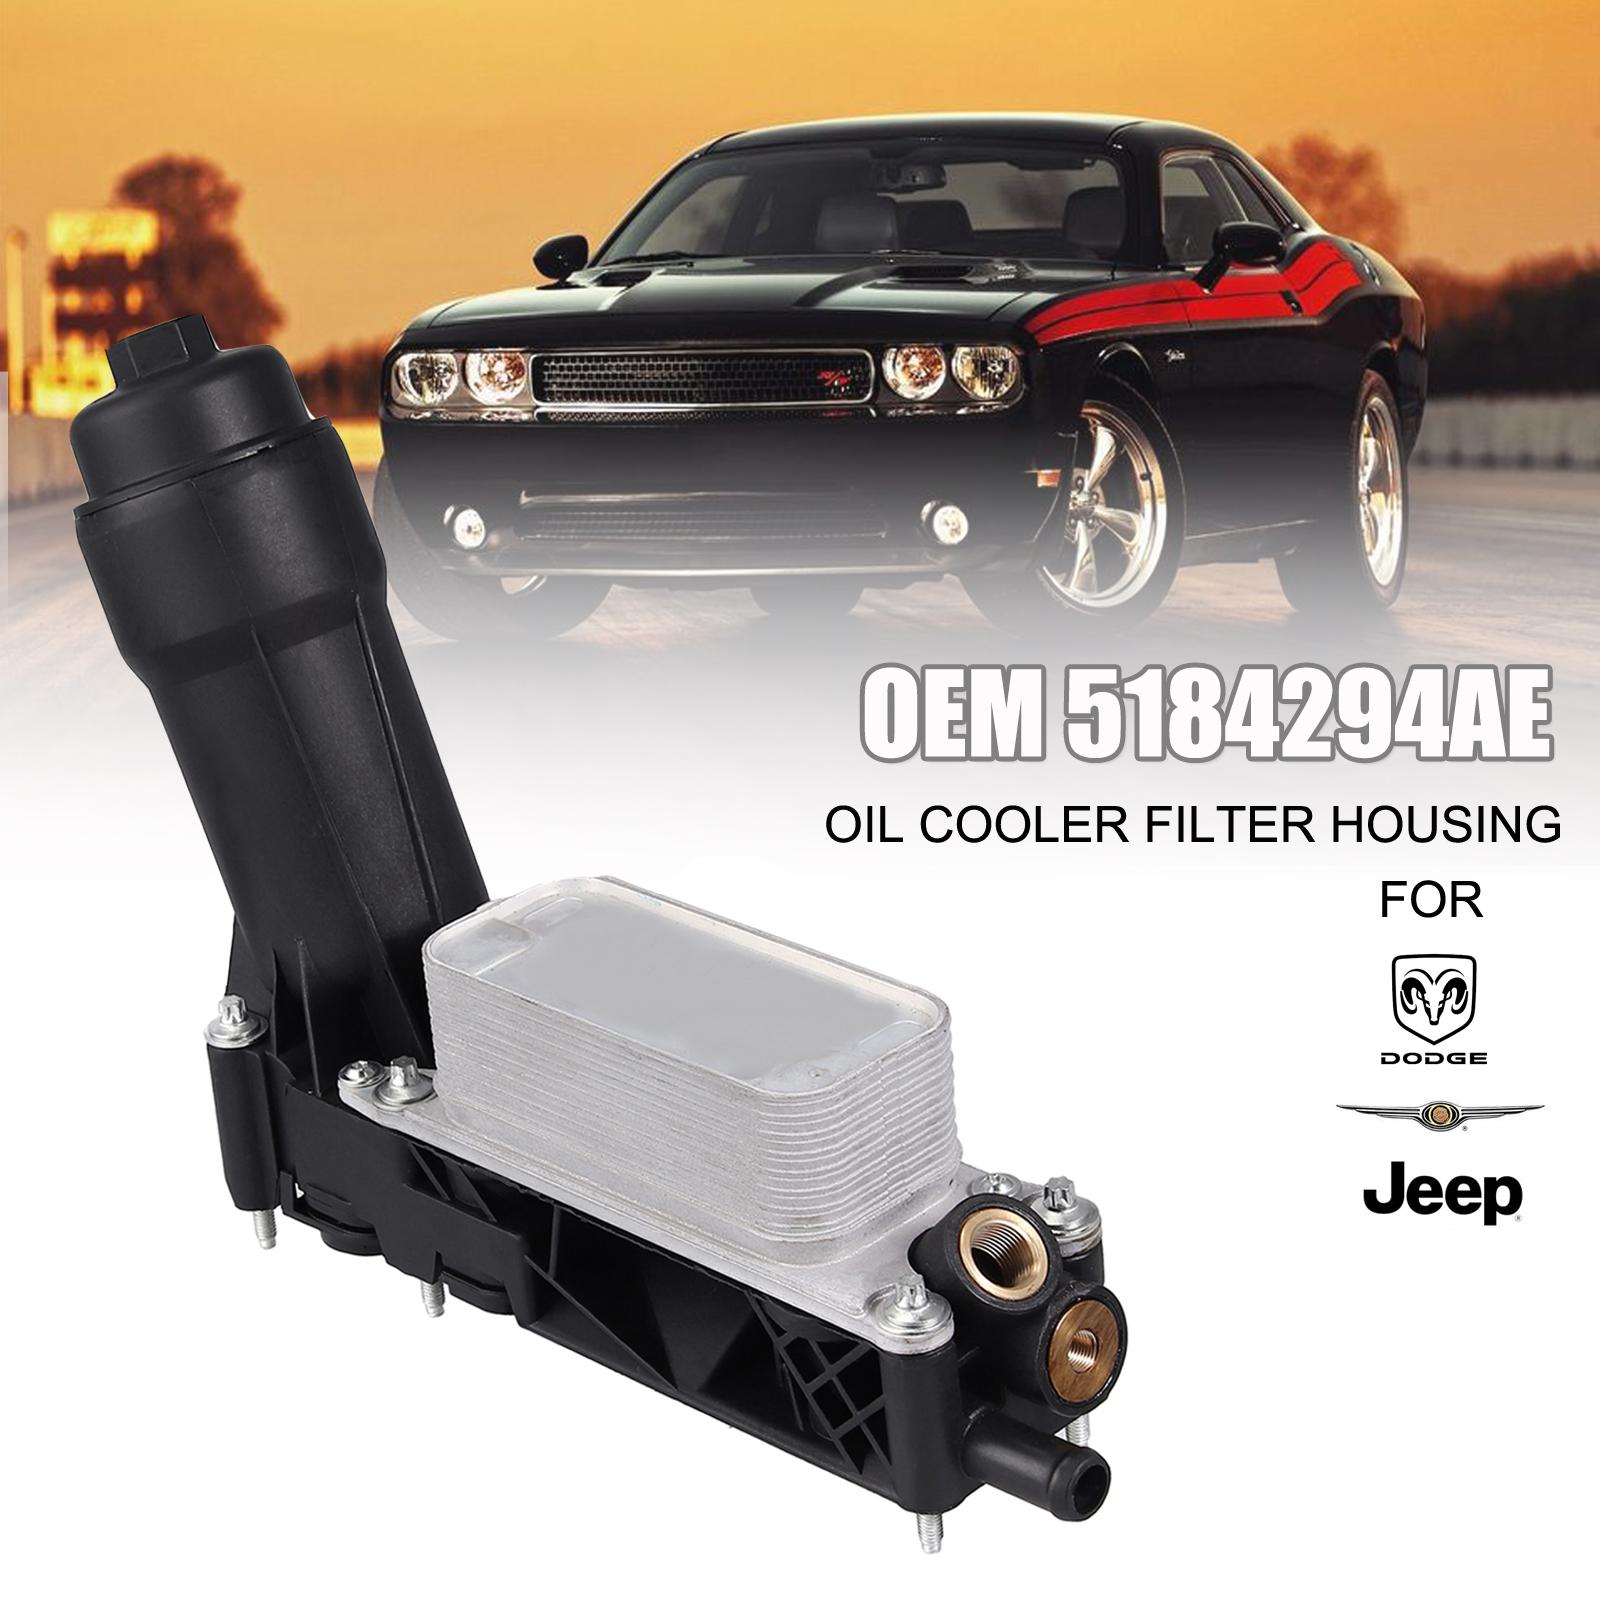 Oil Cooler Filter Housing For 11-13 Jeep Dodge Chrysler Ram 3.6L V6 5184294AE US